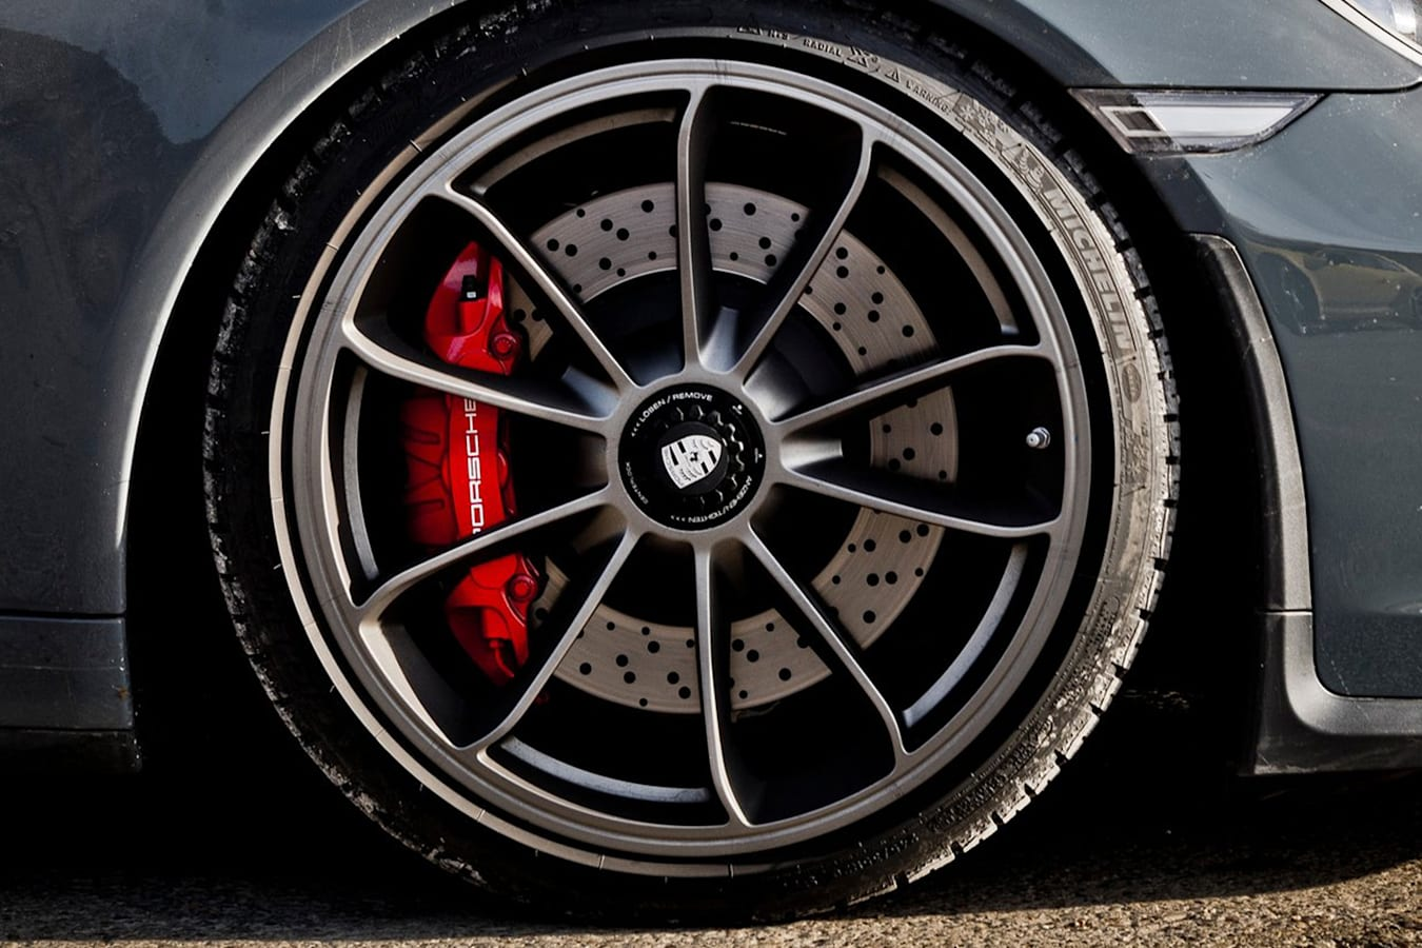 Porsche Gt 3 Touring Wheel Jpg